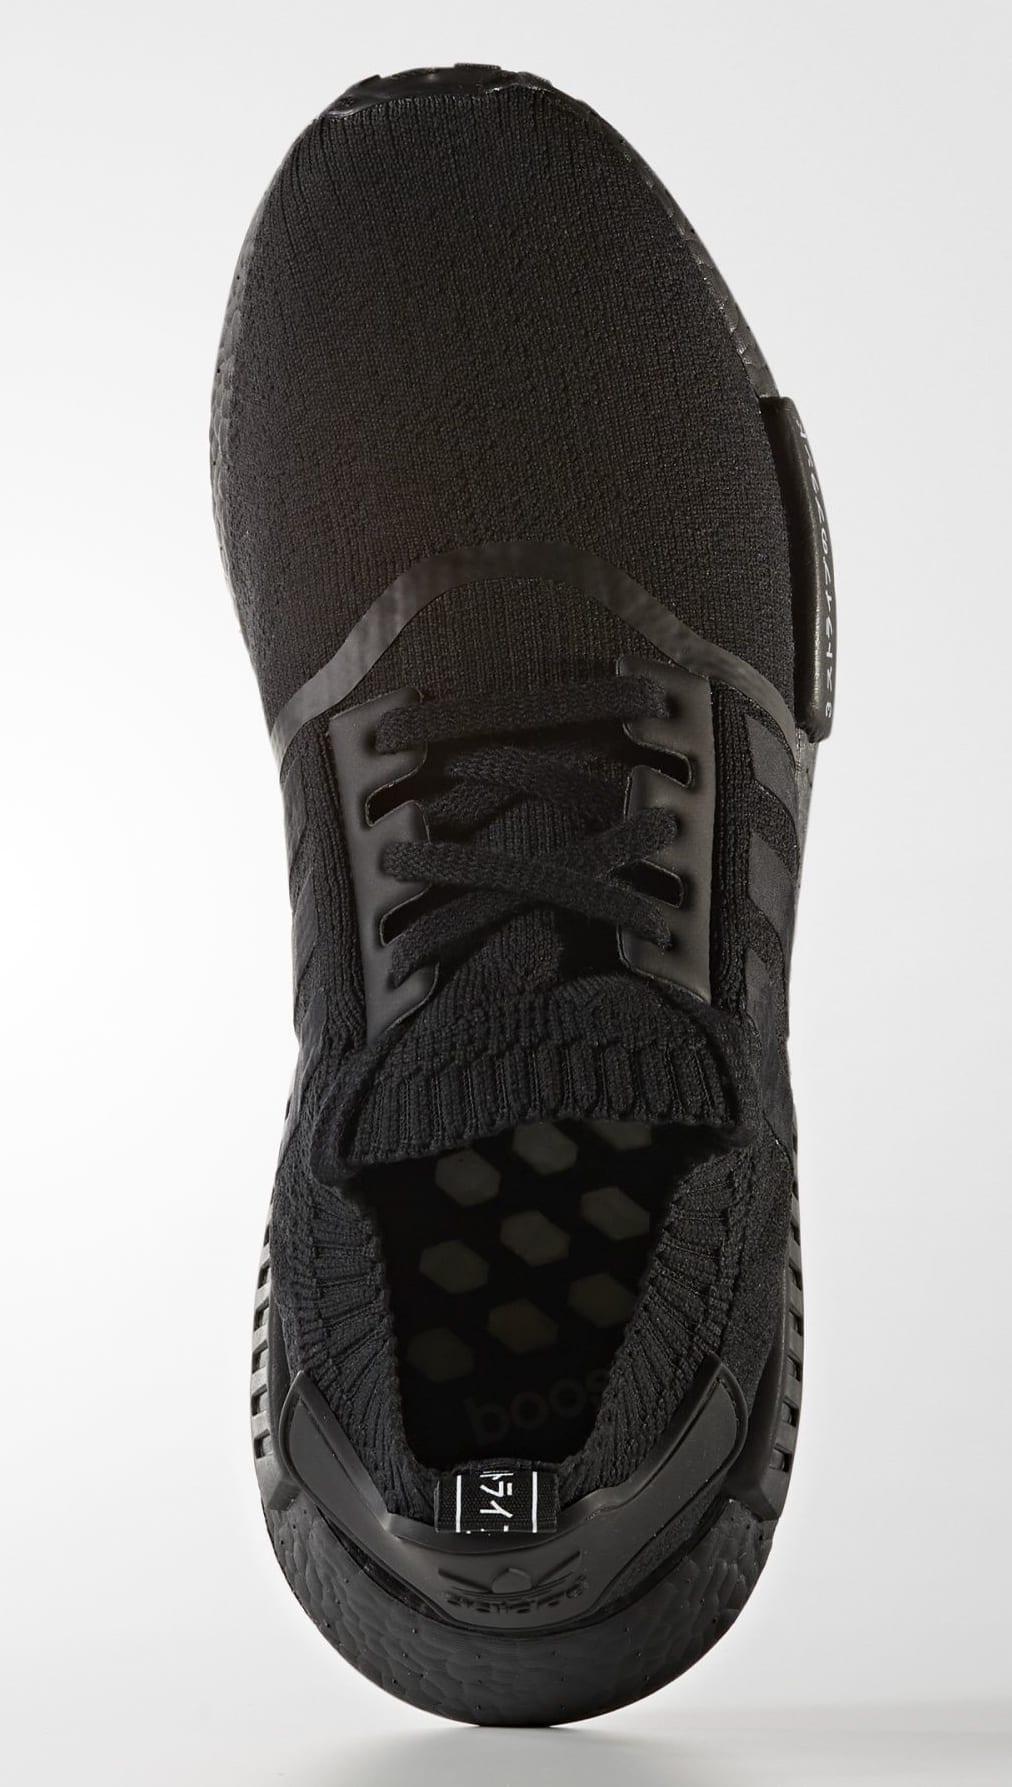 Adidas NMD_R1 PK 'Japan Pack' BZ0220 (Top)